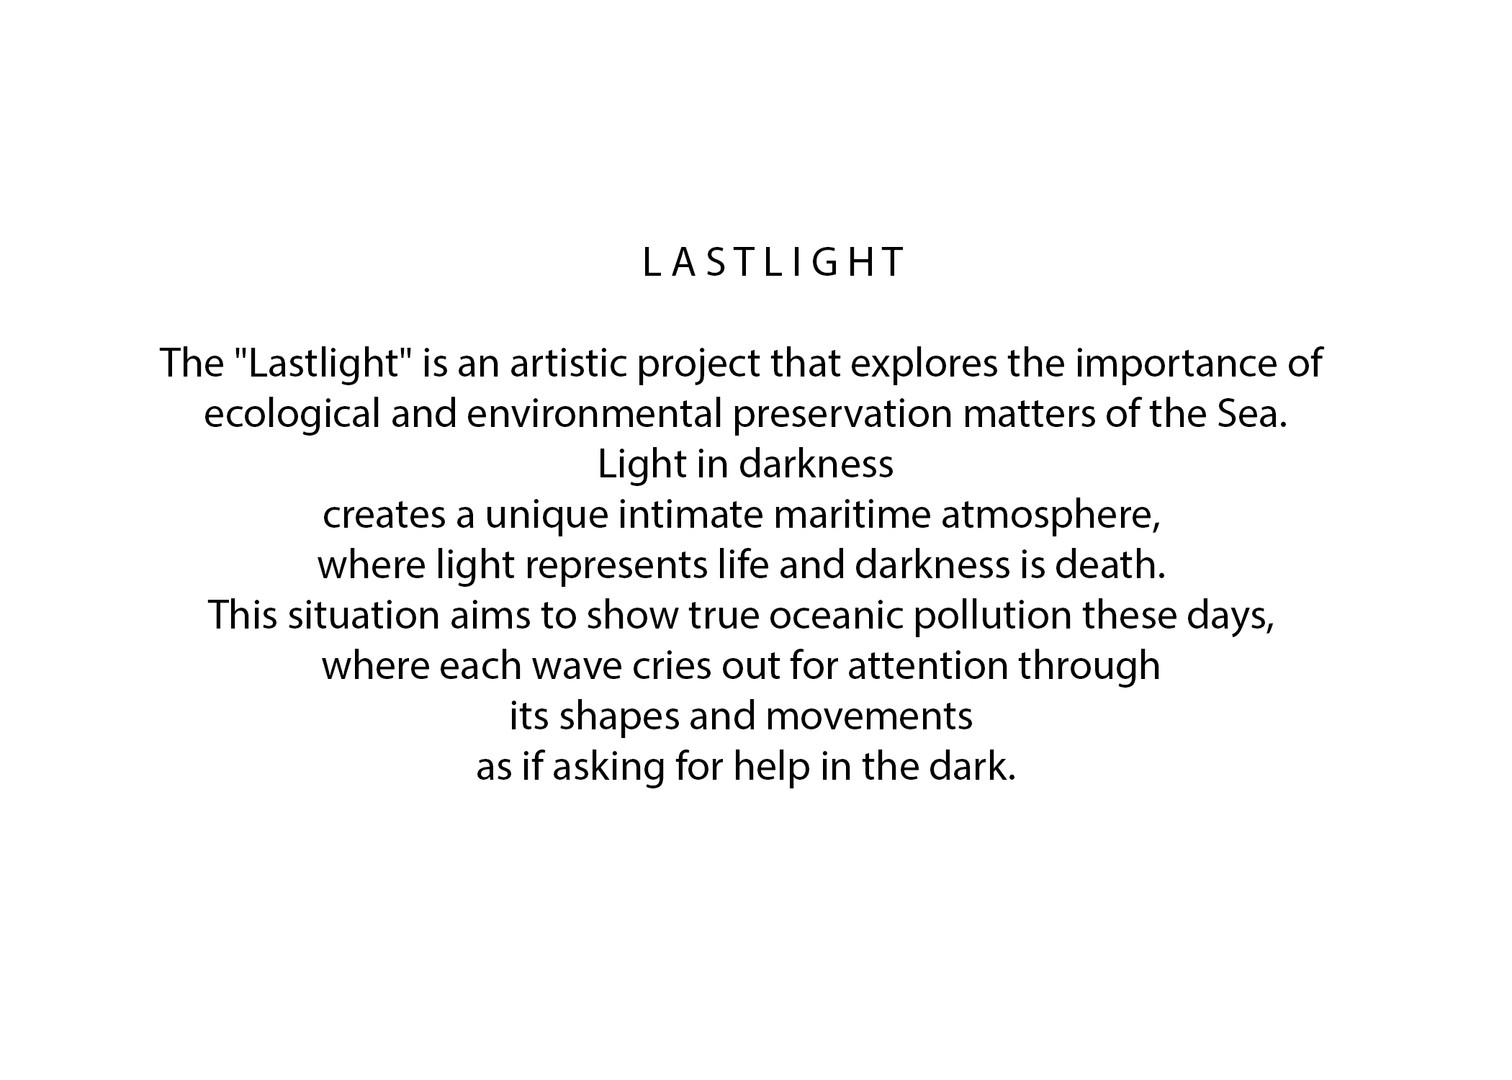 LASTLIGHT project